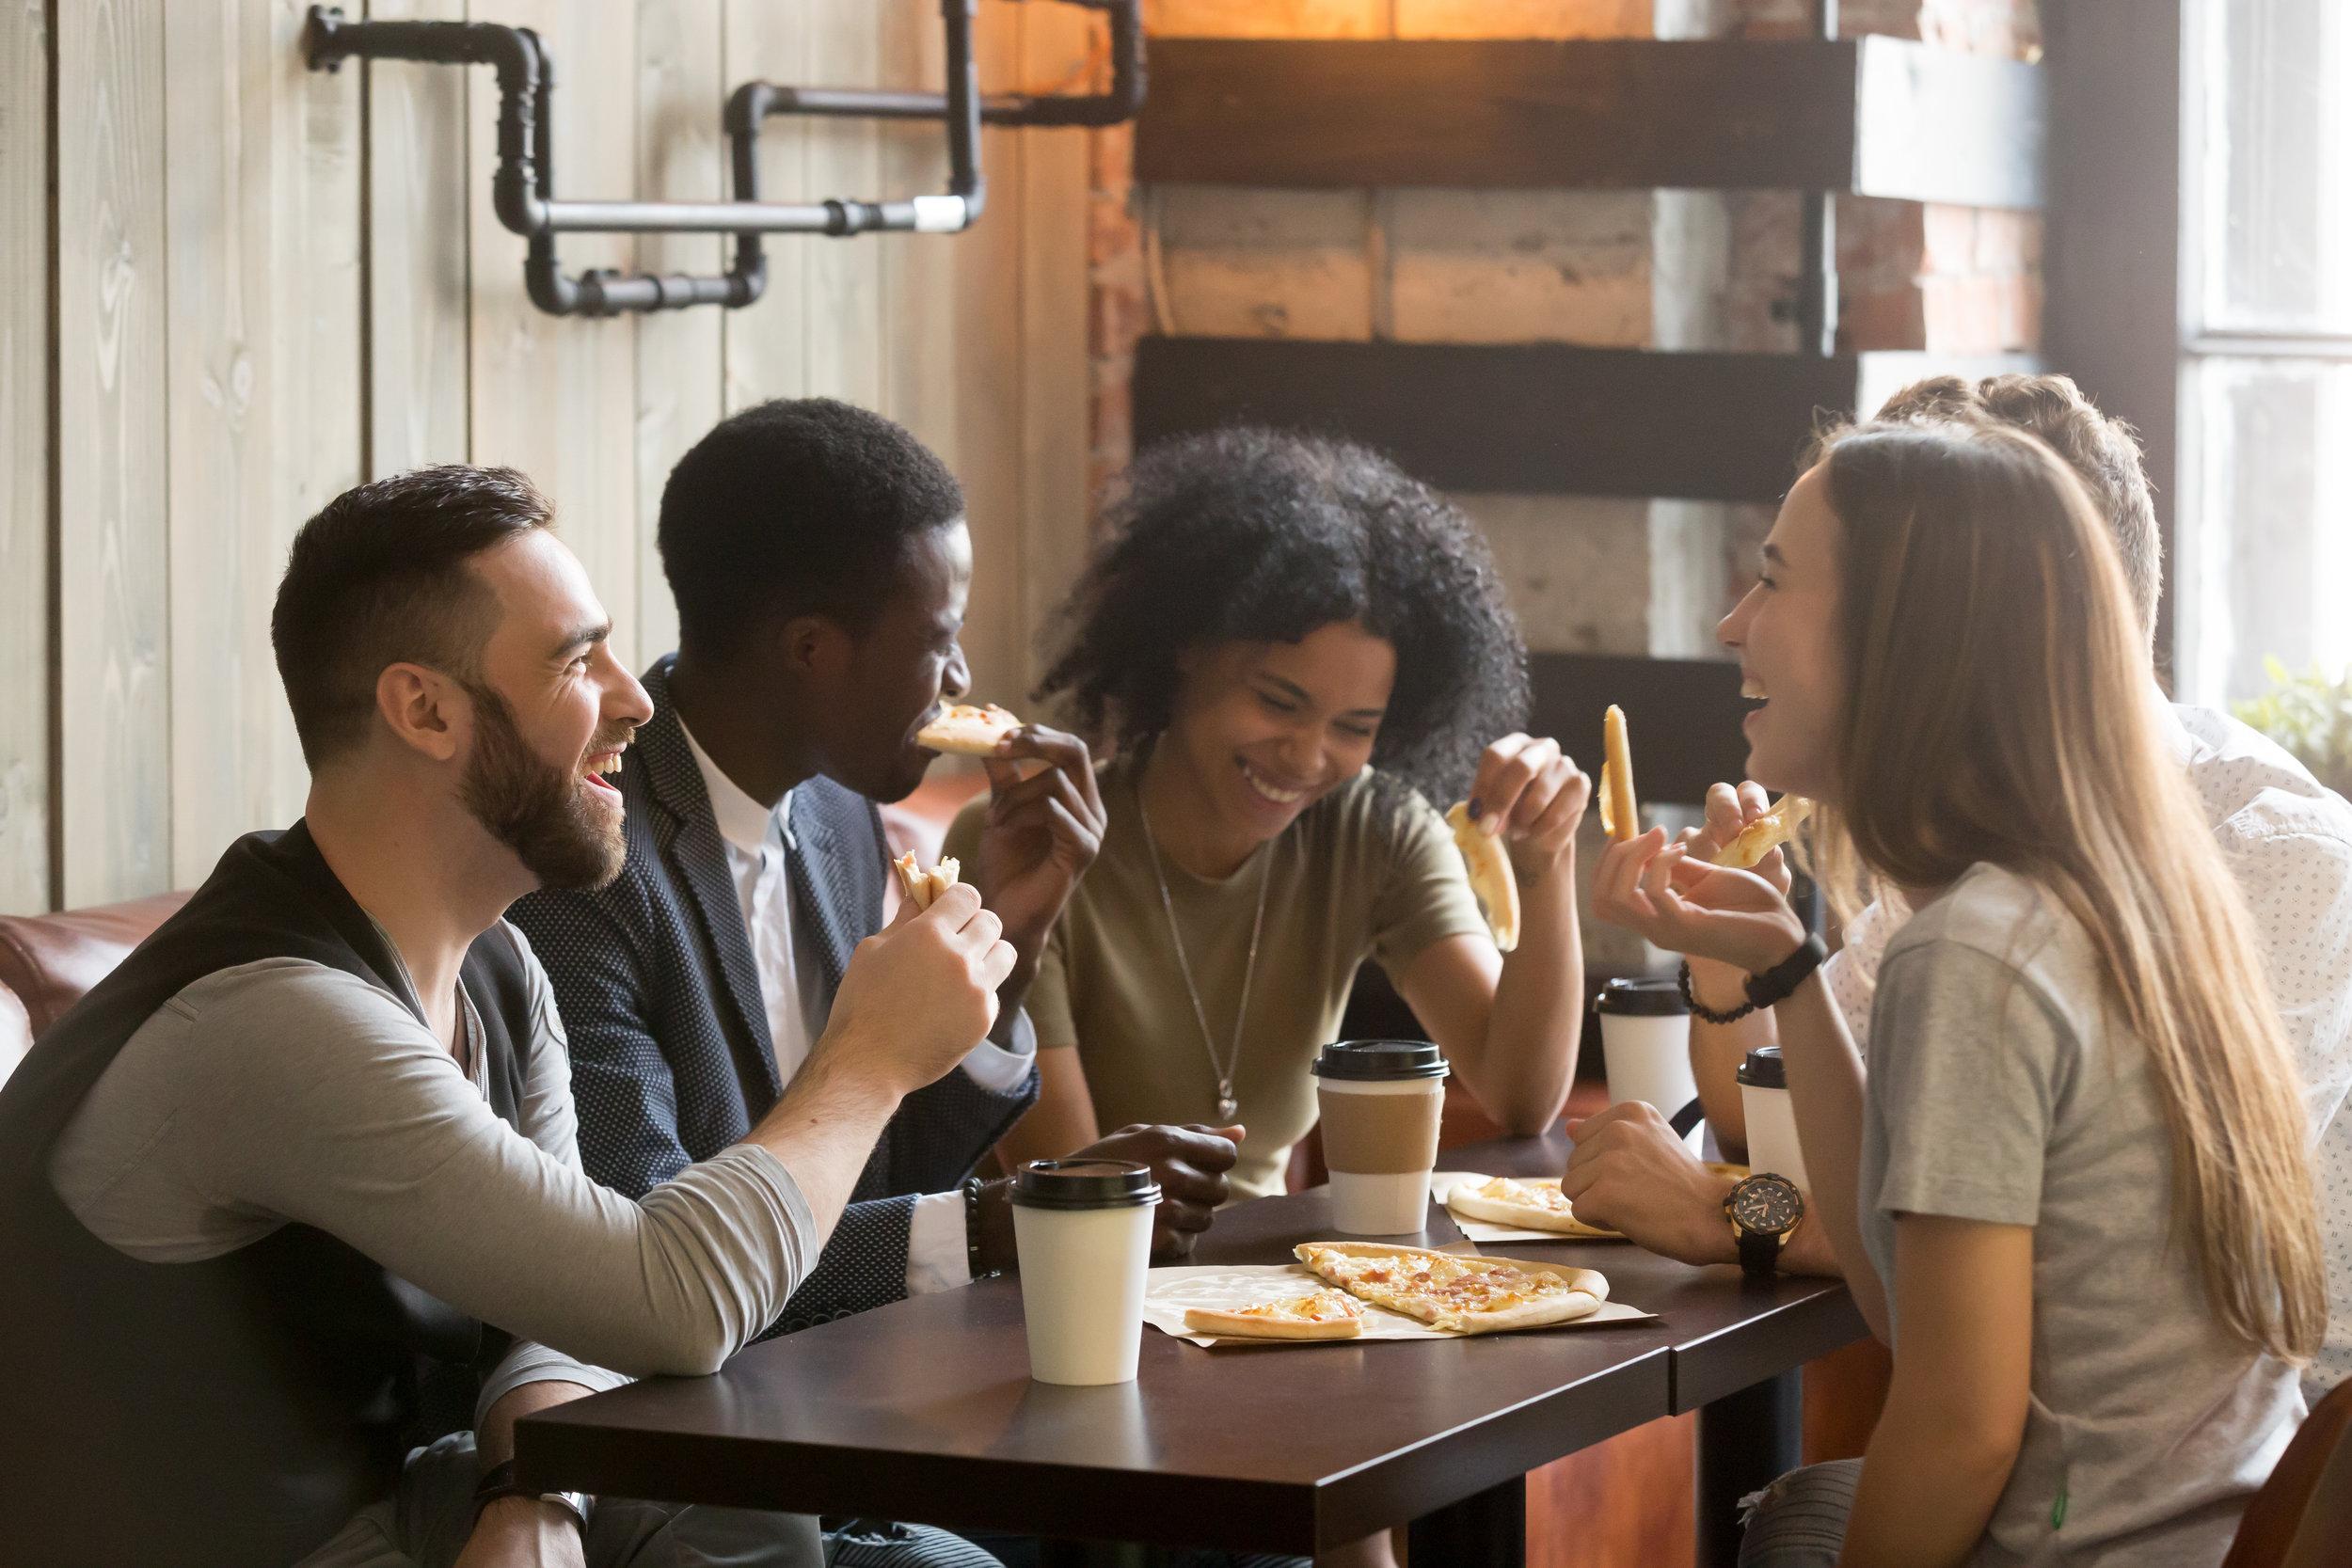 Racial-diversity-among-millennials-implications-for-church